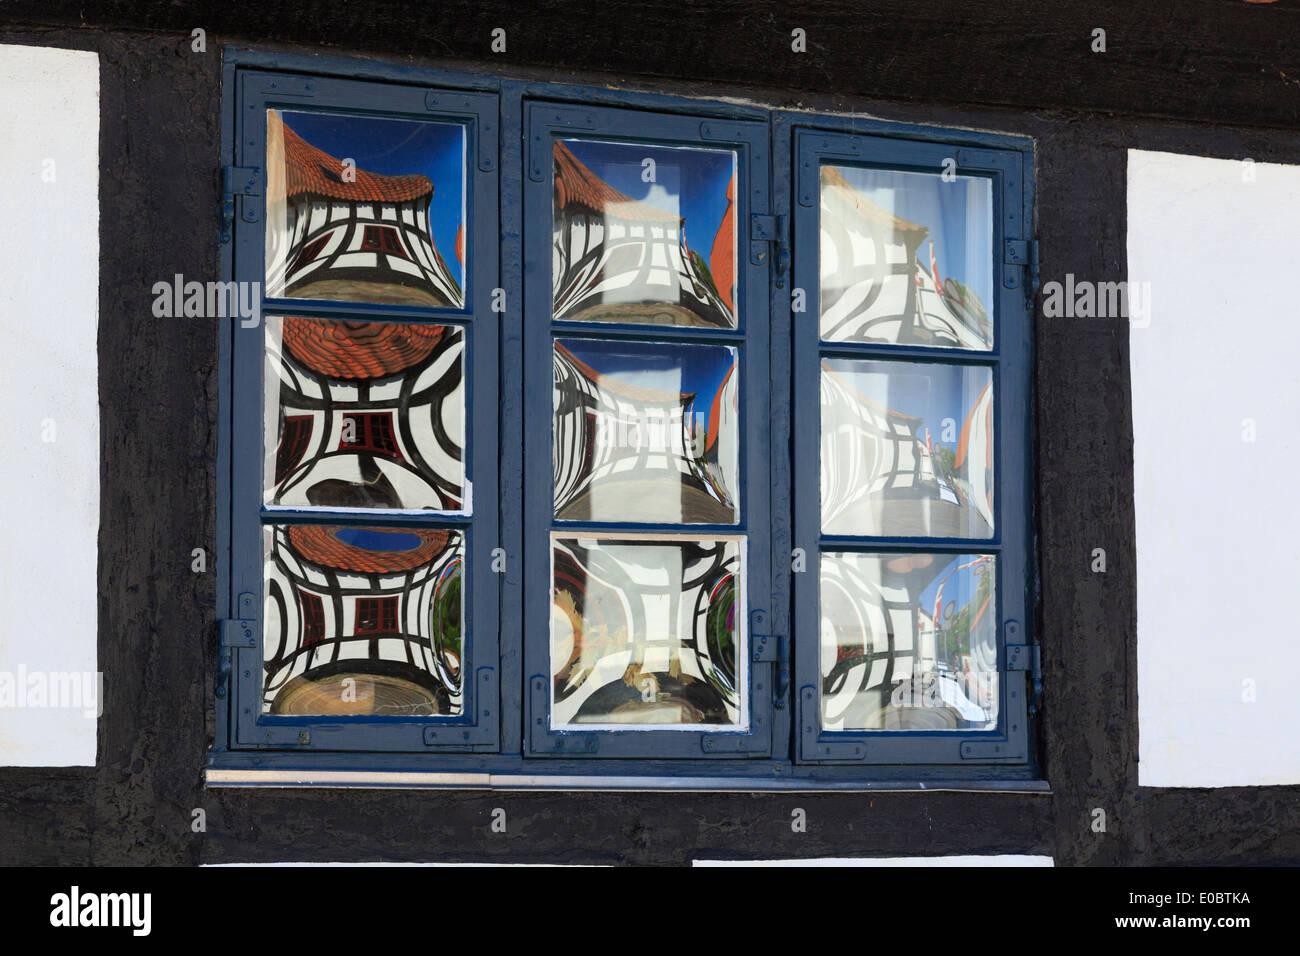 Quaint old glass window panes detail reflecting timbered house in Ebeltoft, Jutland, Denmark, Scandinavia, Europe - Stock Image